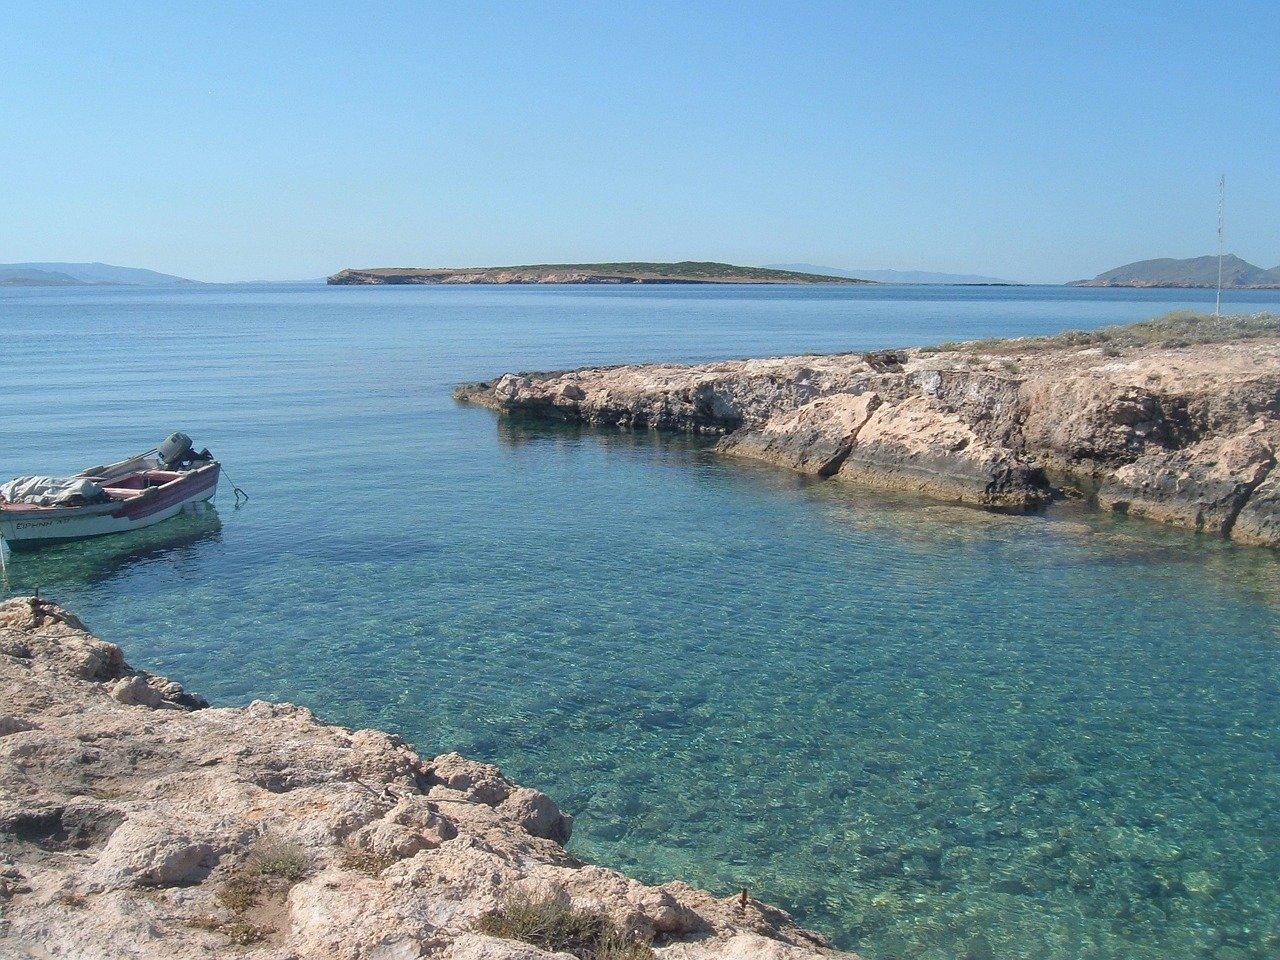 Greek Island of Paros